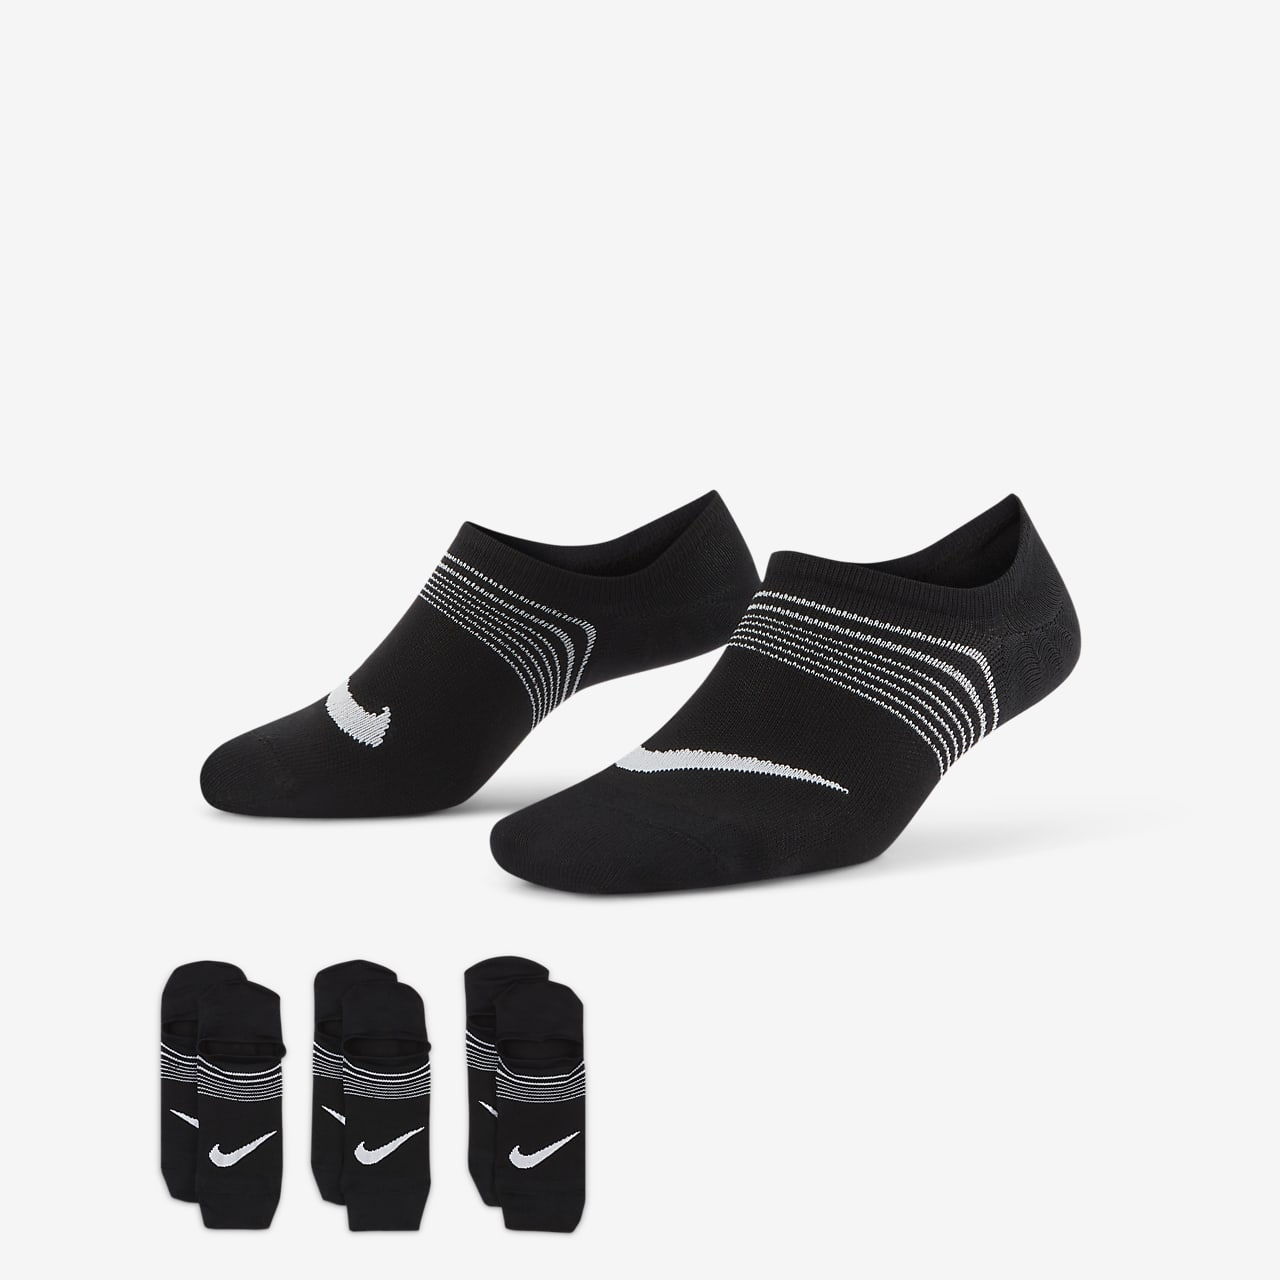 Nike Lightweight Training Socks (3 Pair)